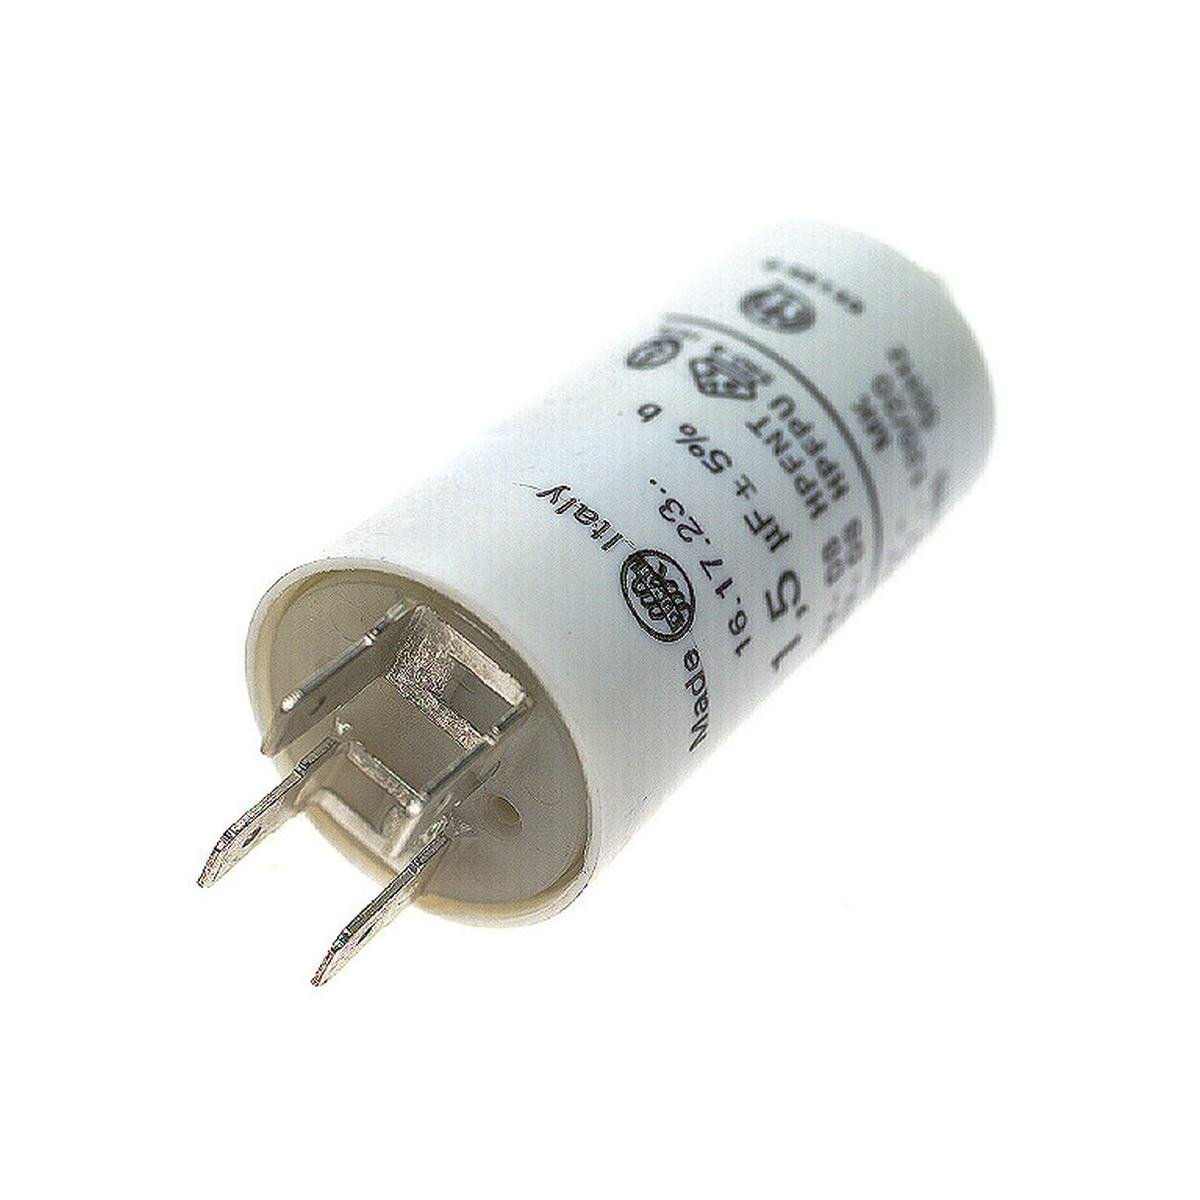 Kondensator 14,0 µF 450V